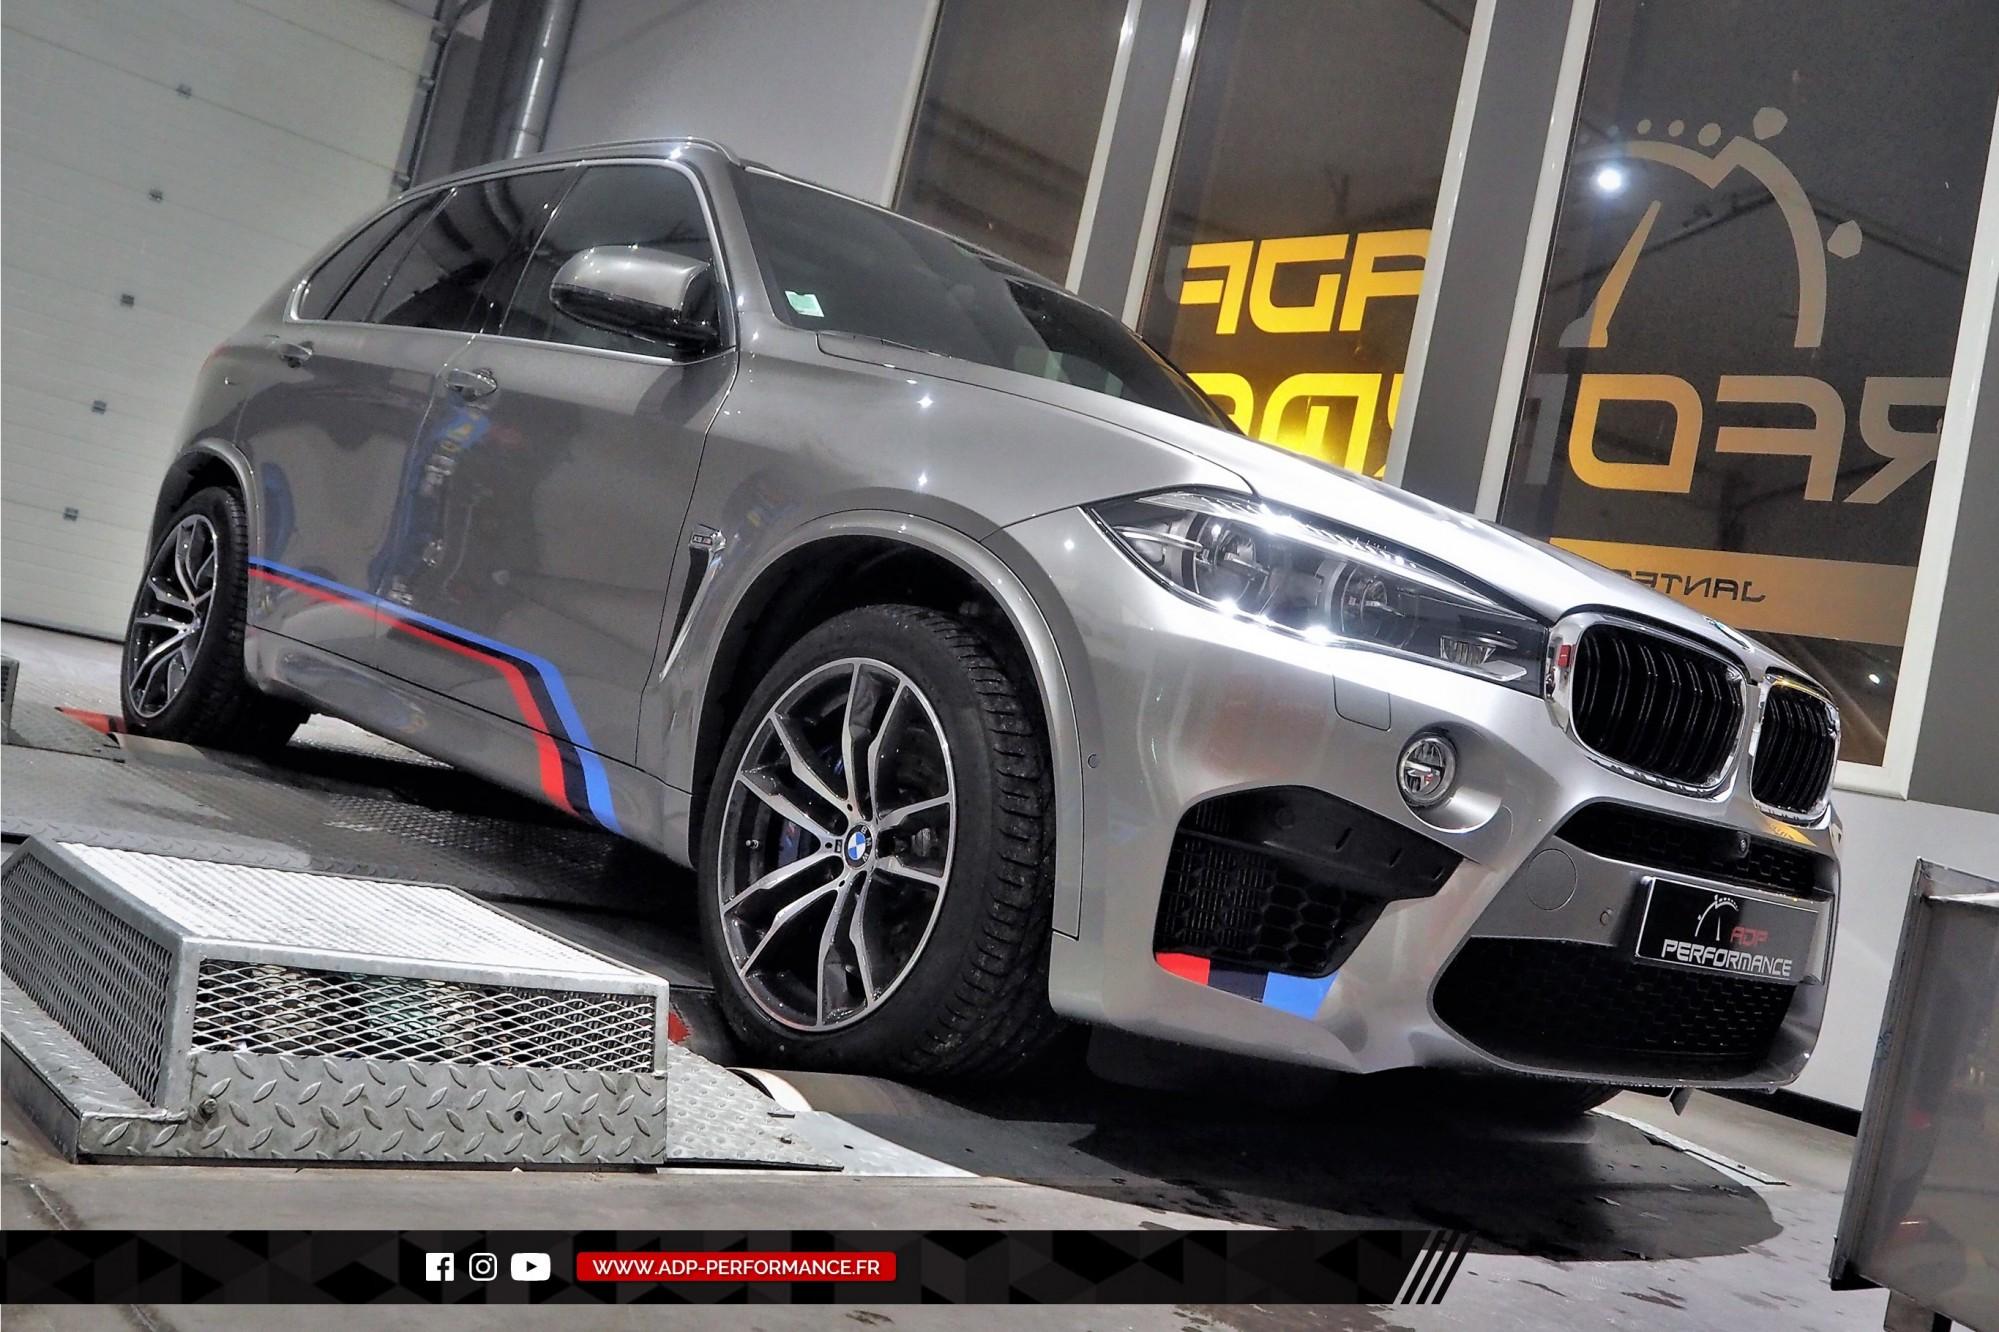 Reprogrammation moteur Marseille - Echappement Akrapovic - BMW X5 M 4.4 V8 Bi-Turbo